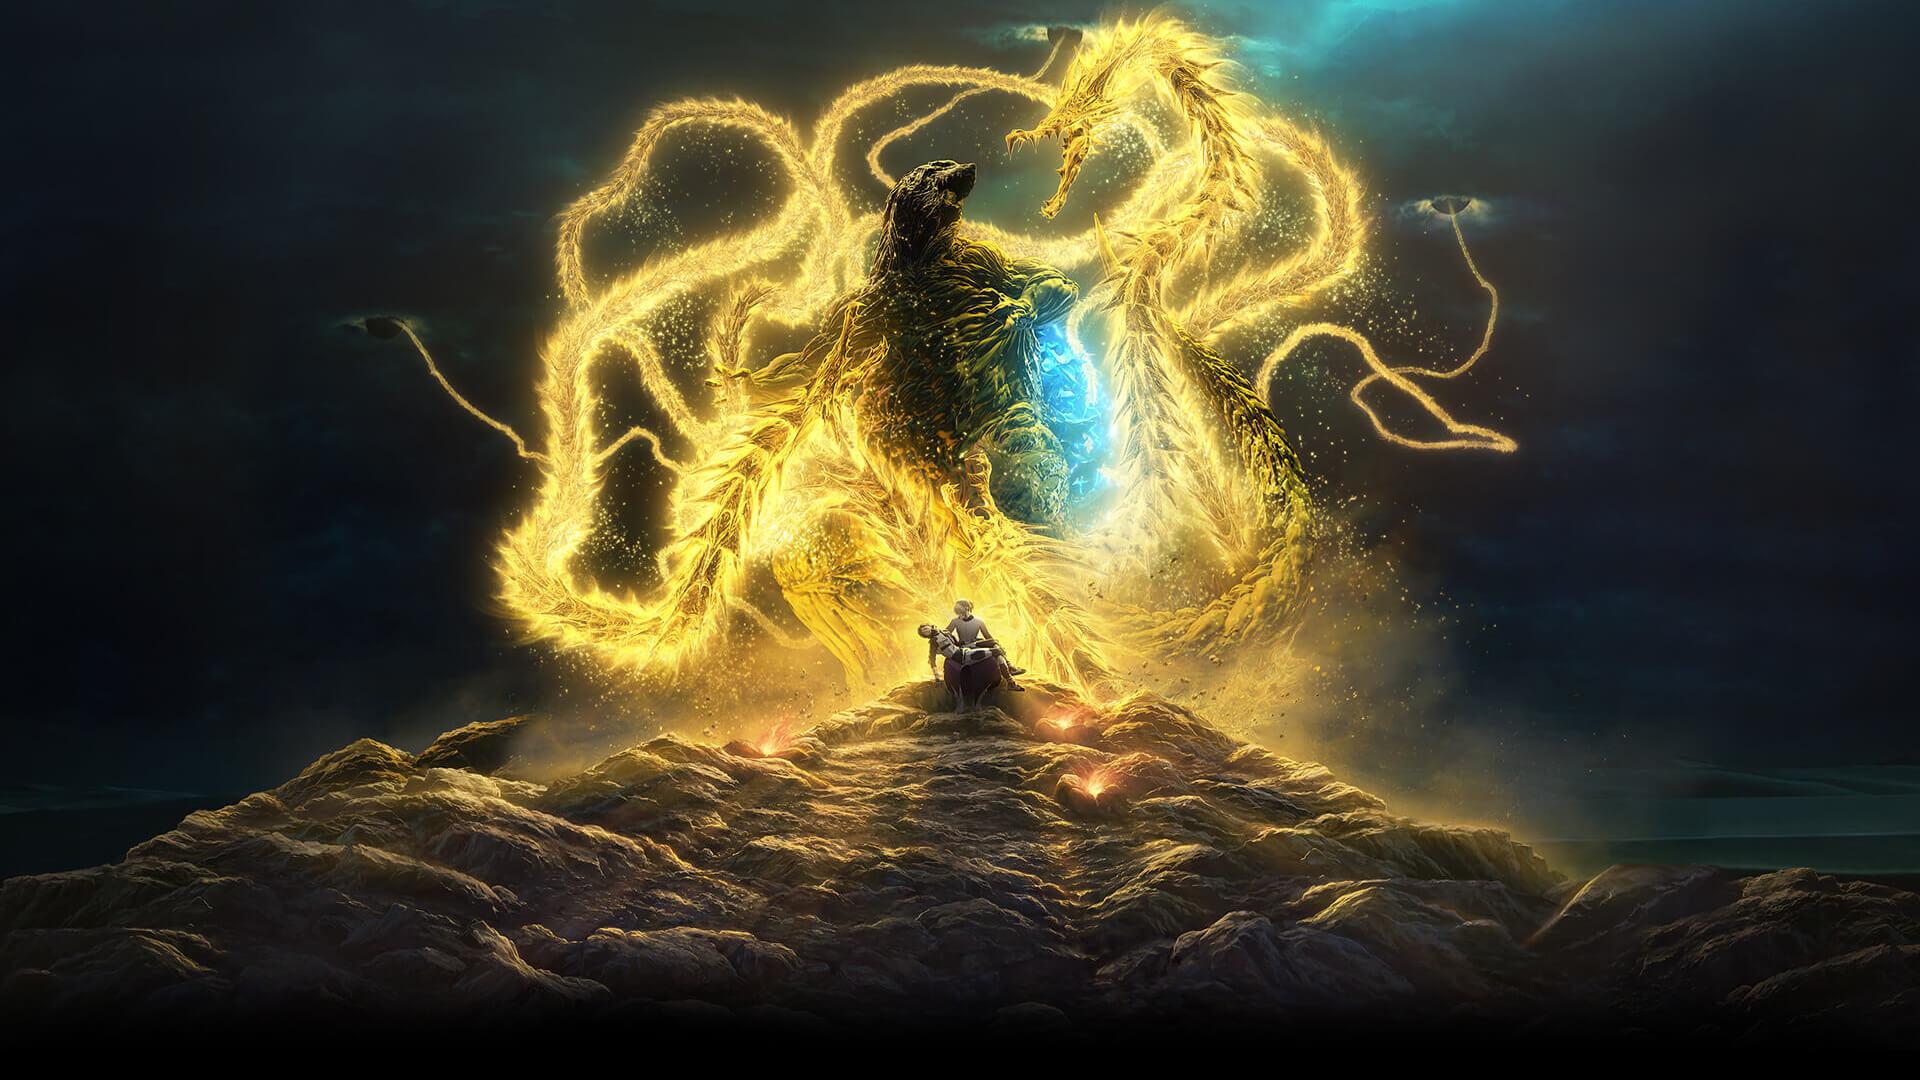 Godzilla The Planet Eater By Godzilla Image On Deviantart